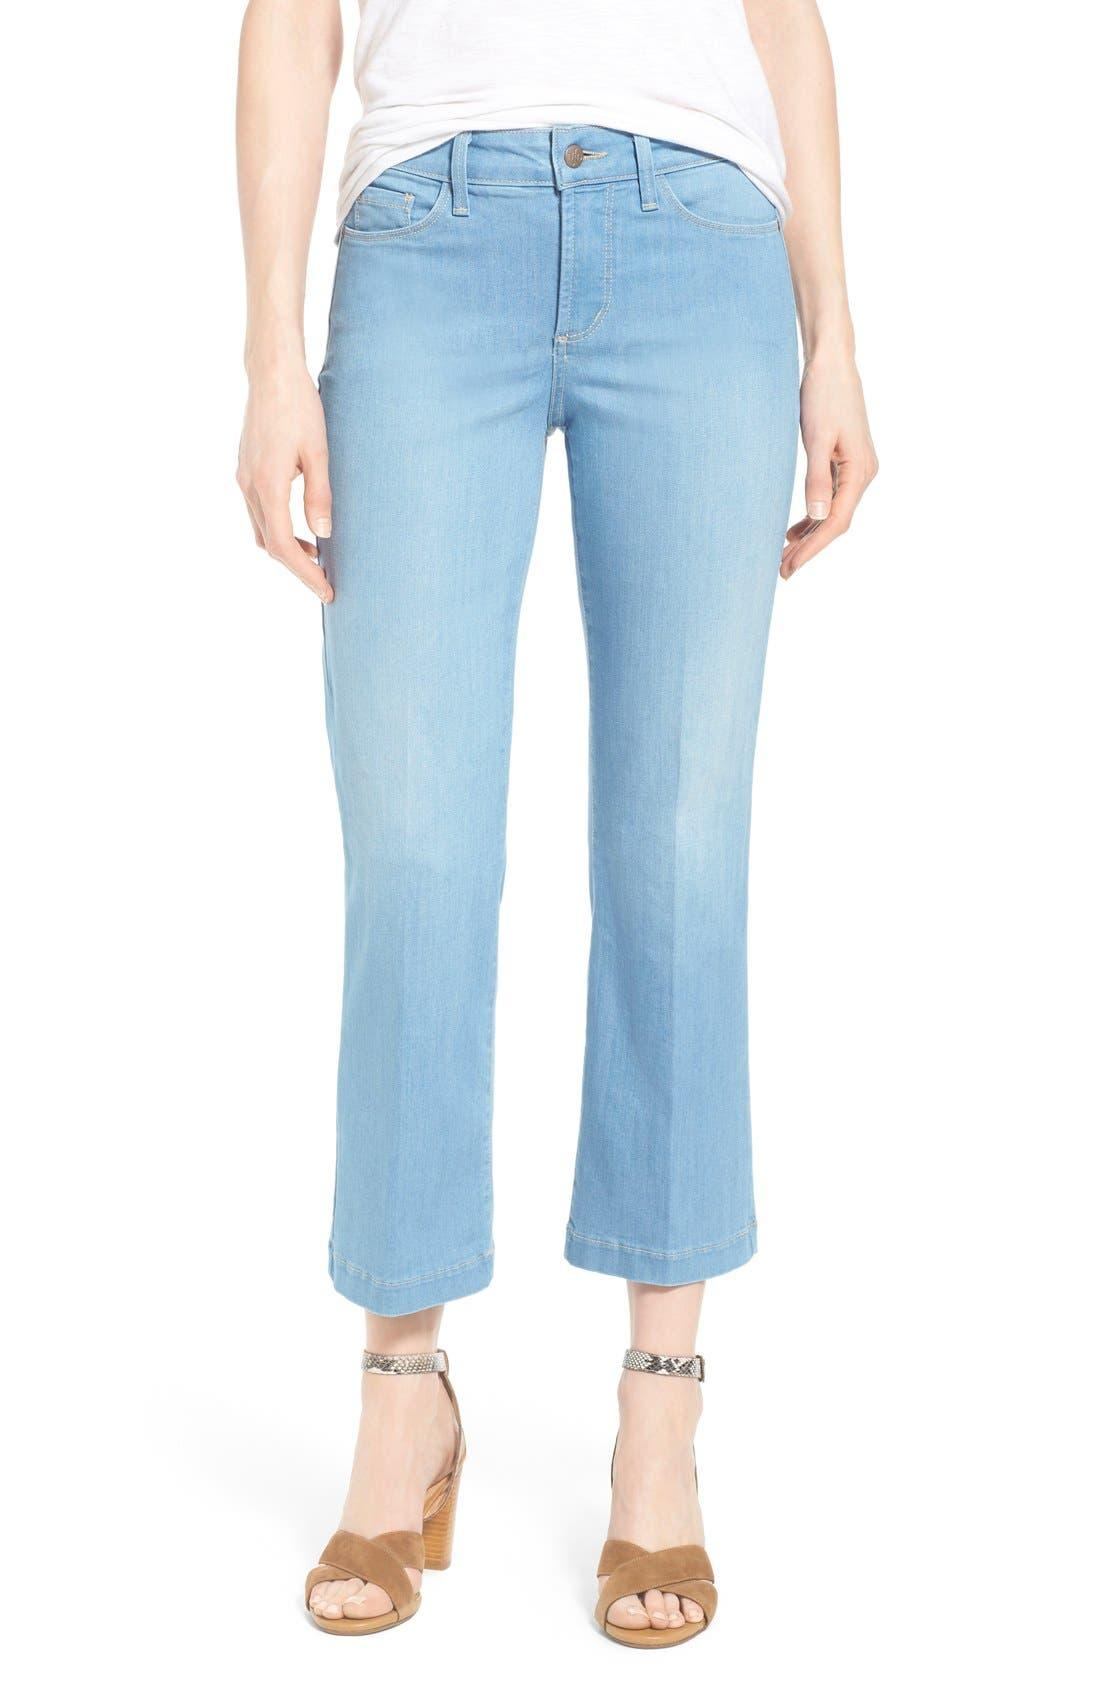 Alternate Image 1 Selected - NYDJ 'Sophia' Stretch Ankle Flare Leg Jeans (Palm Bay)